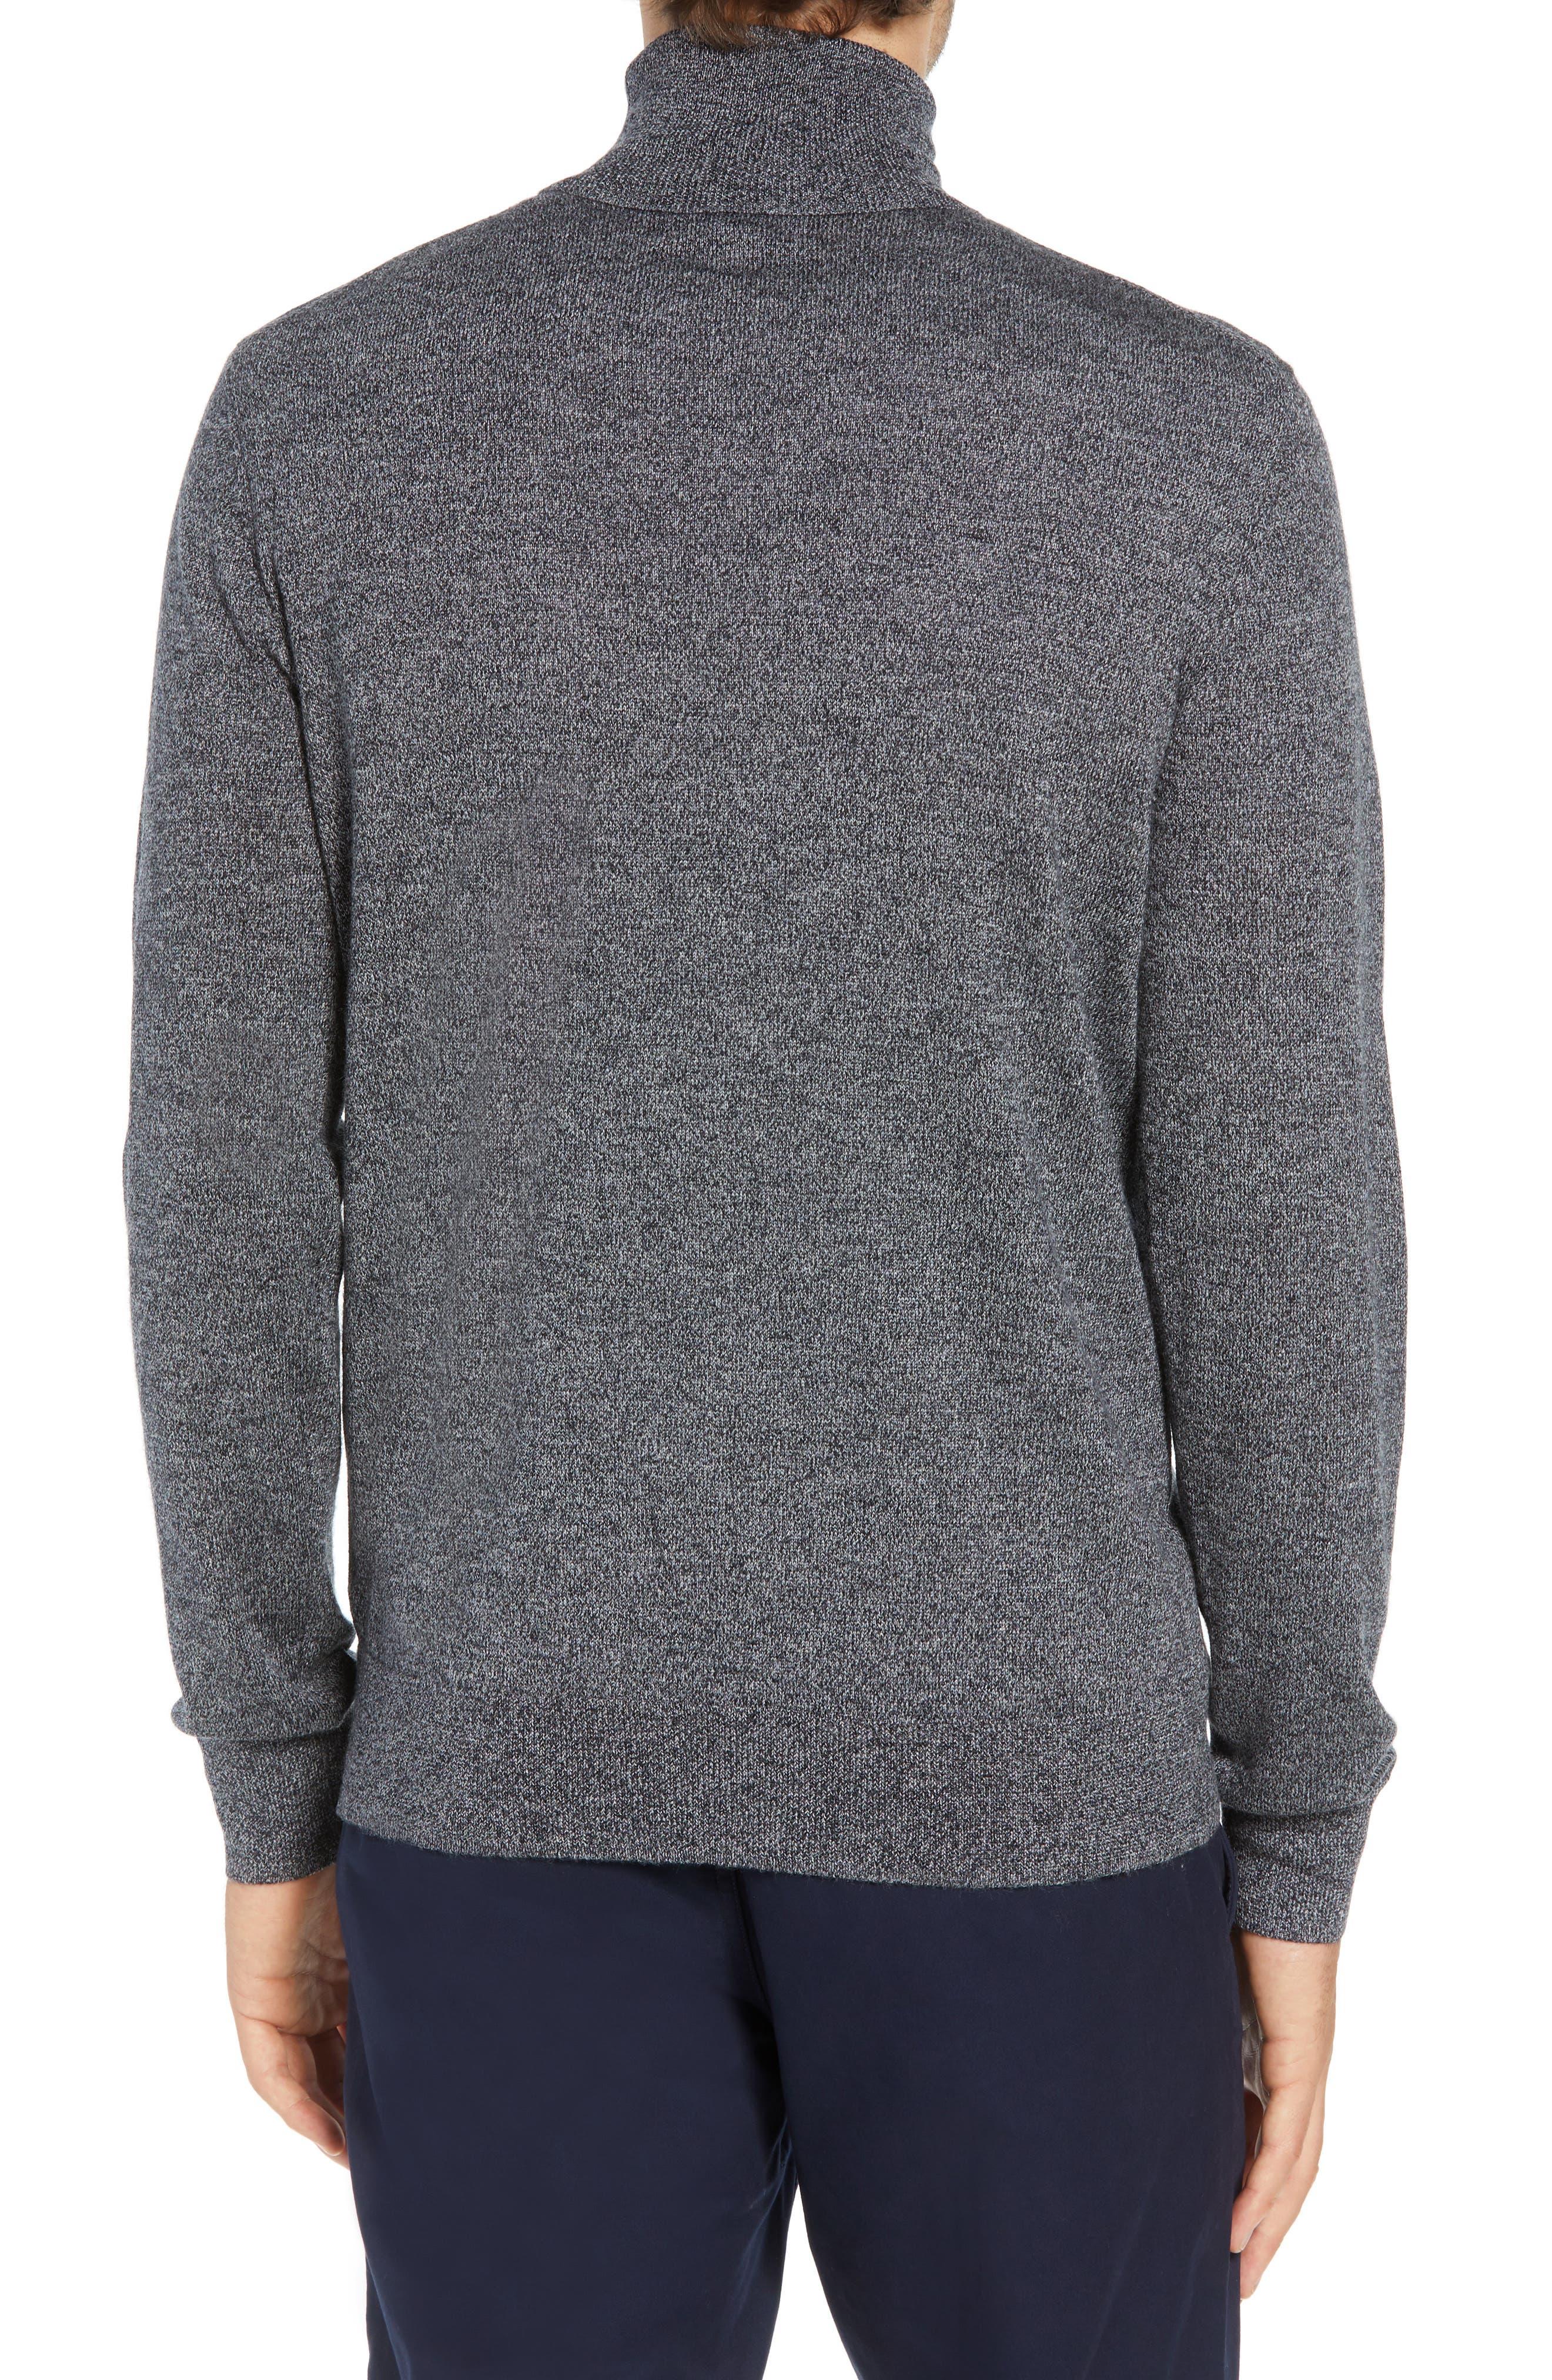 Slim Fit Turtleneck Merino Wool Sweater,                             Alternate thumbnail 2, color,                             CHARCOAL MARL